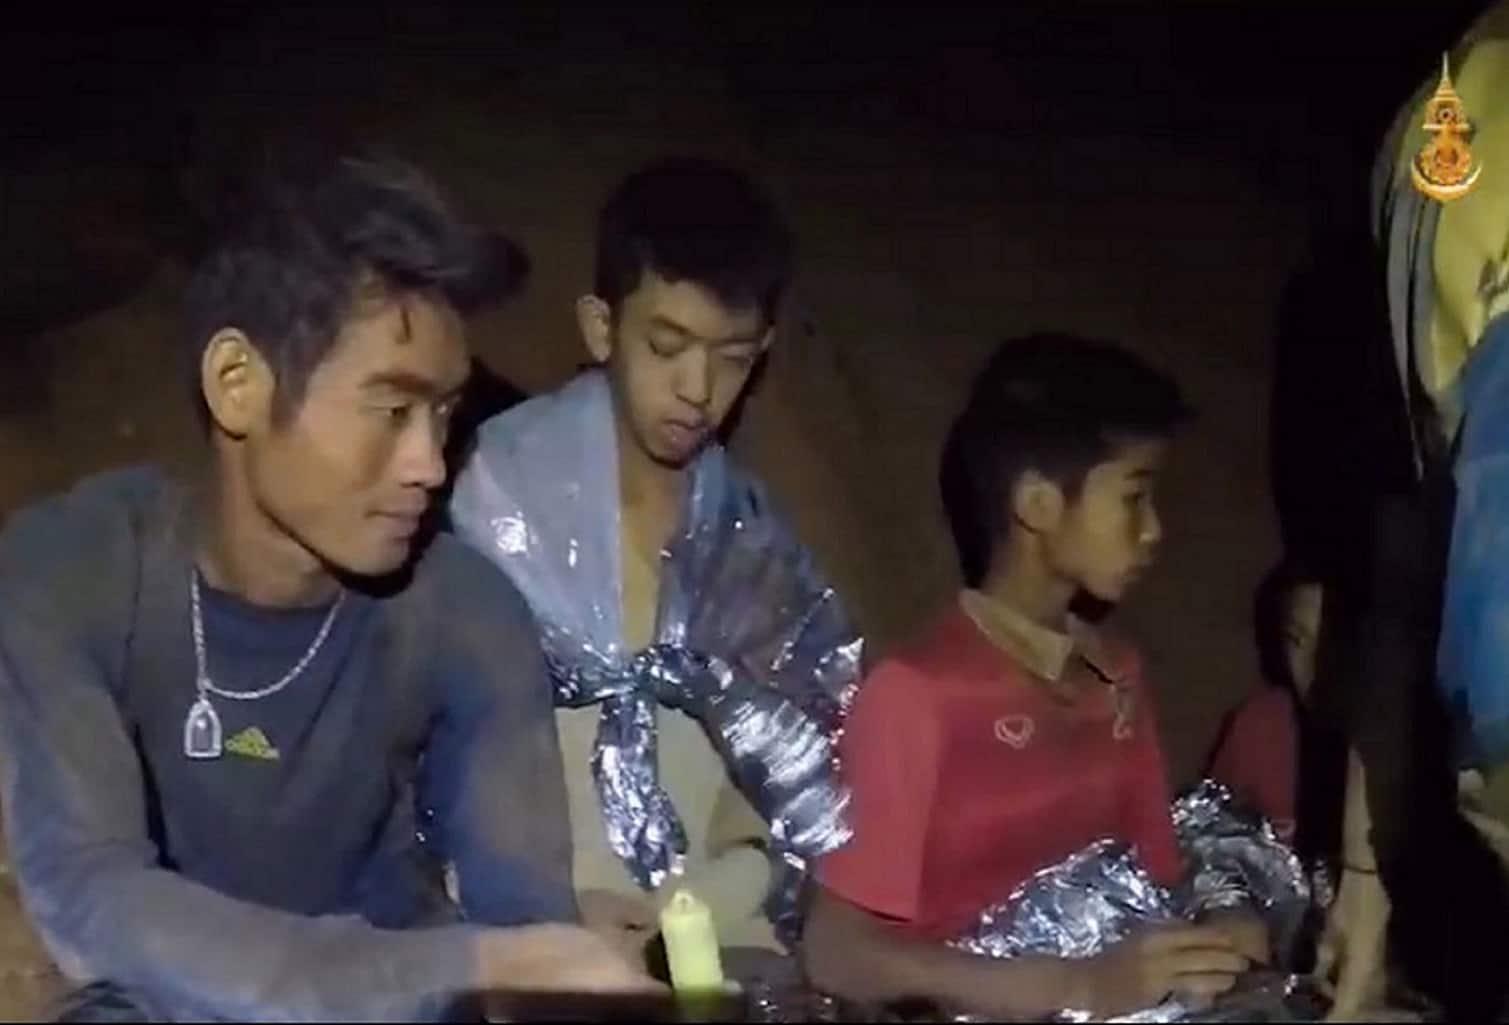 Operación de rescate de miembros de un equipo de fútbol continúa en Tailandia